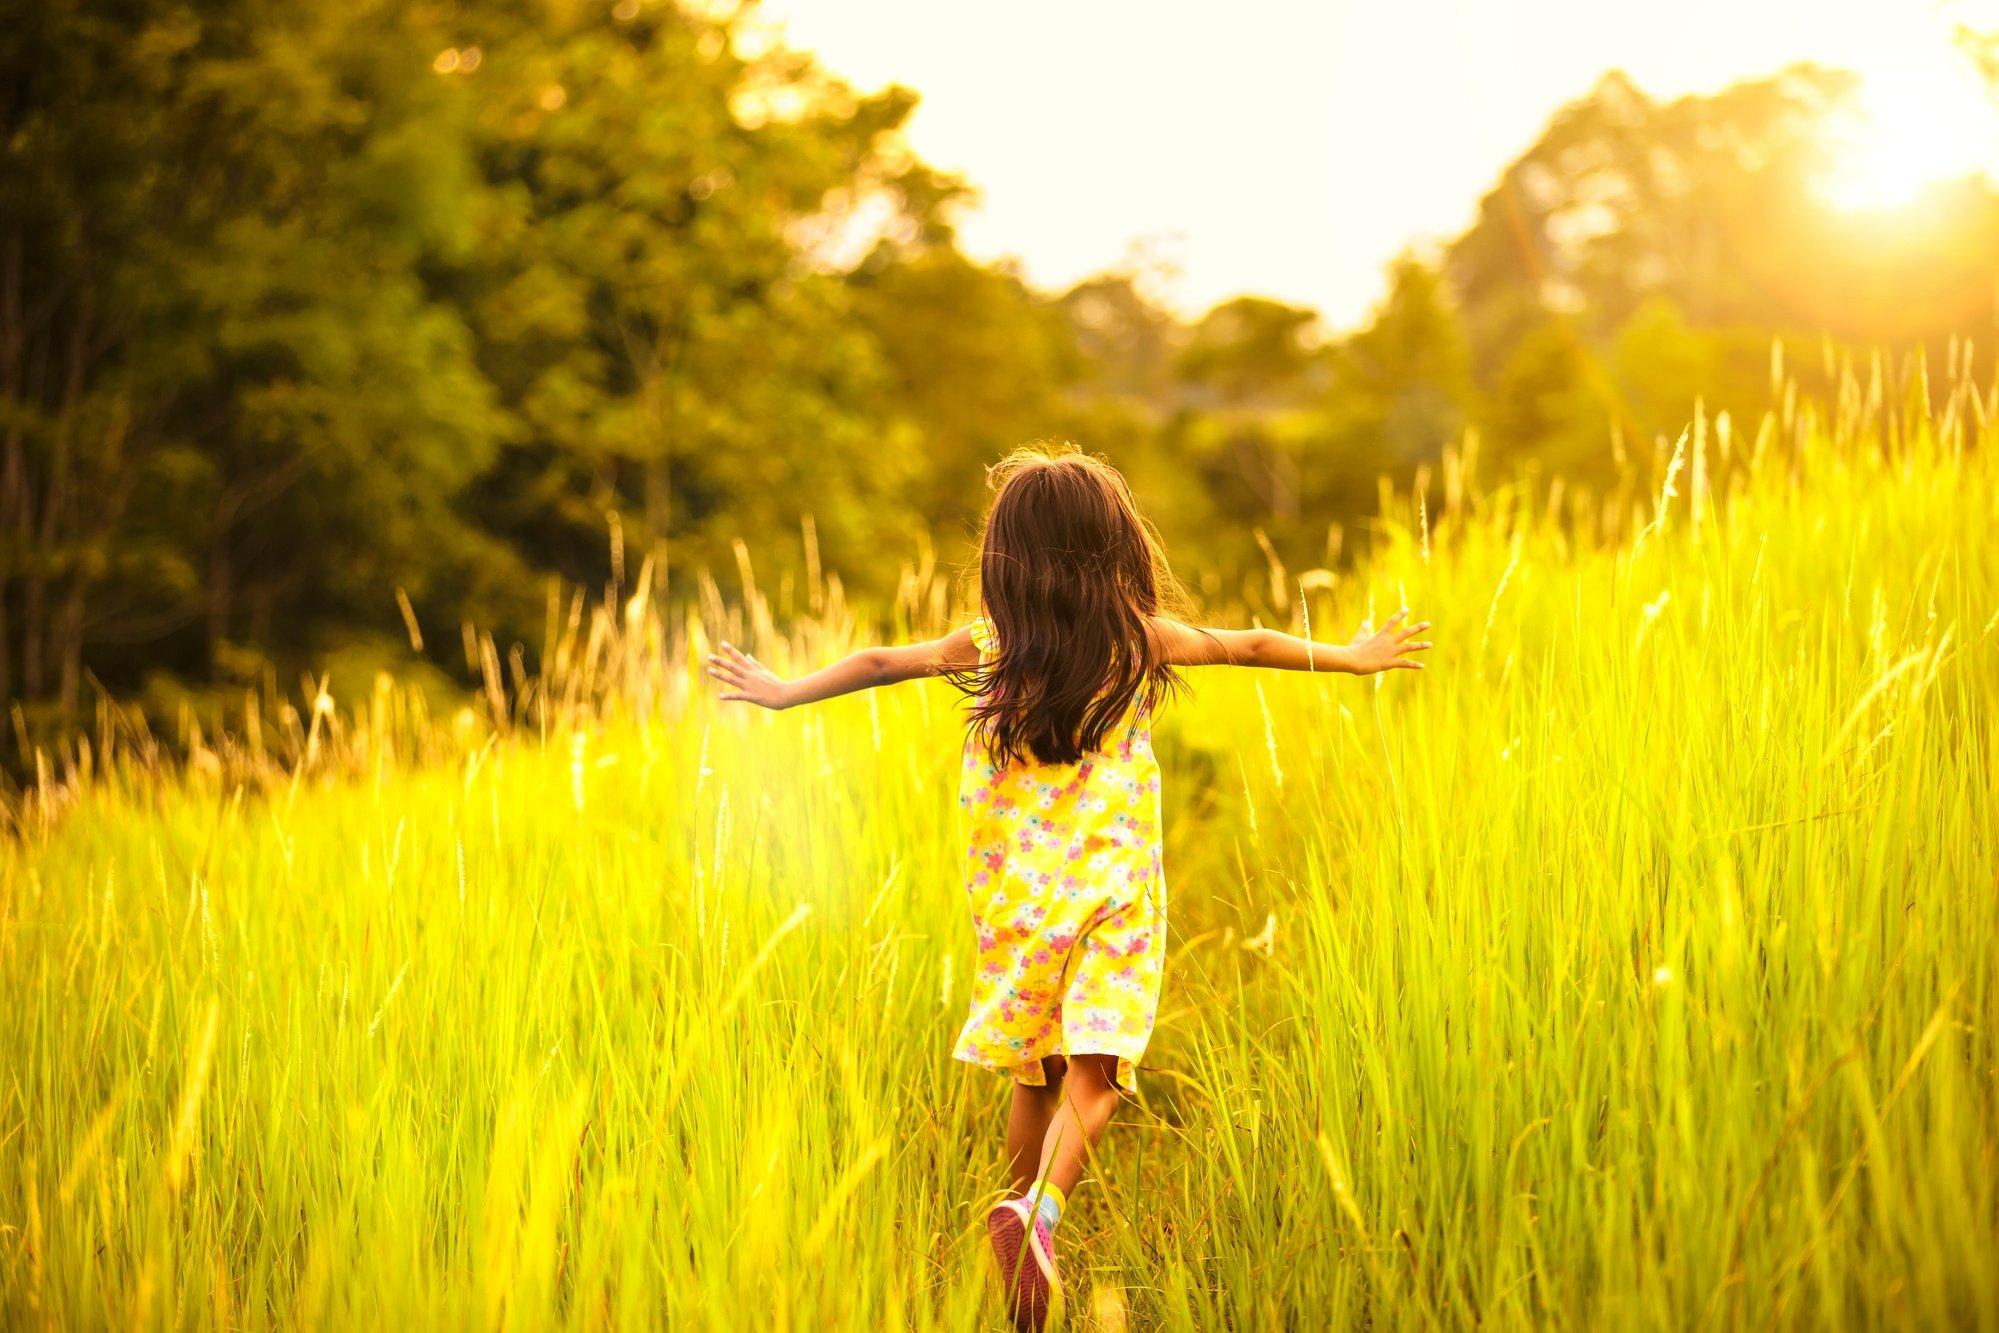 Little girl running though meadow